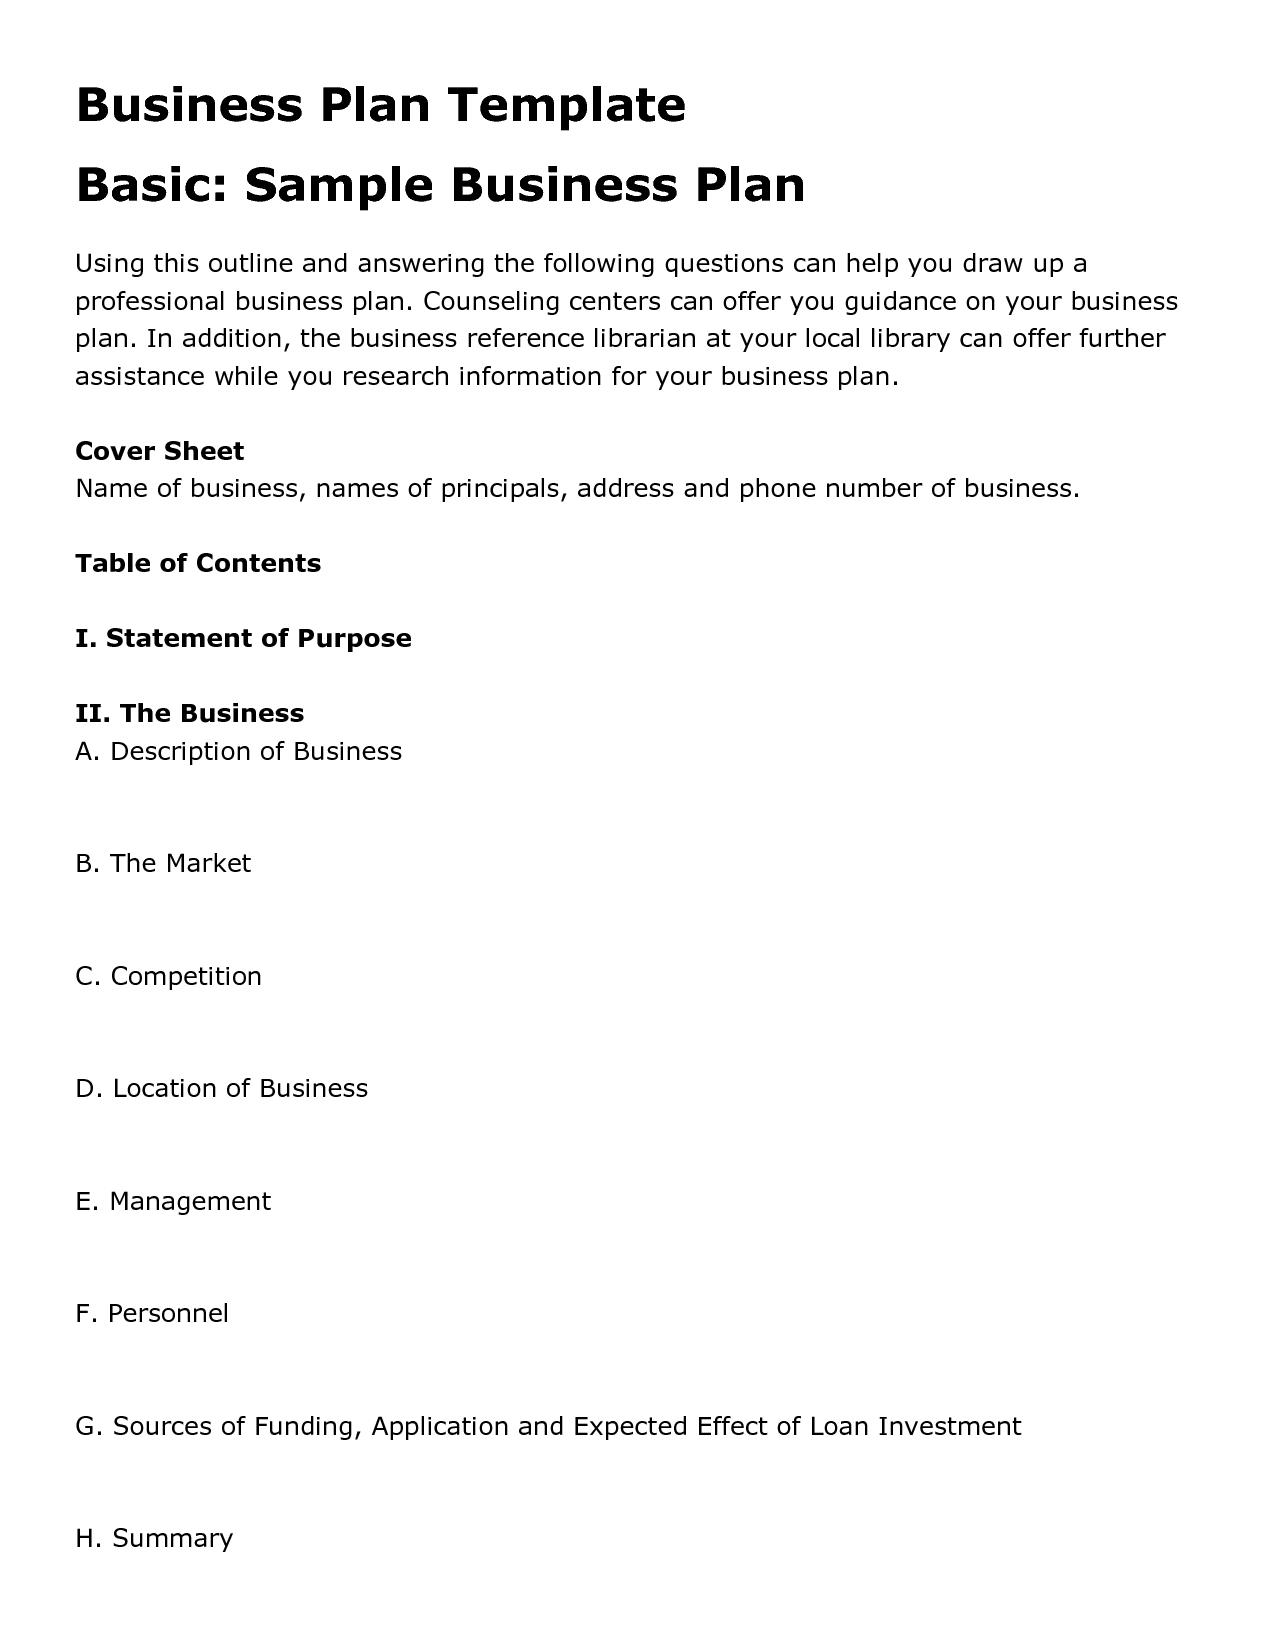 Printable Sample Business Plan Template Form | Forms And Template In - Free Printable Simple Business Plan Template